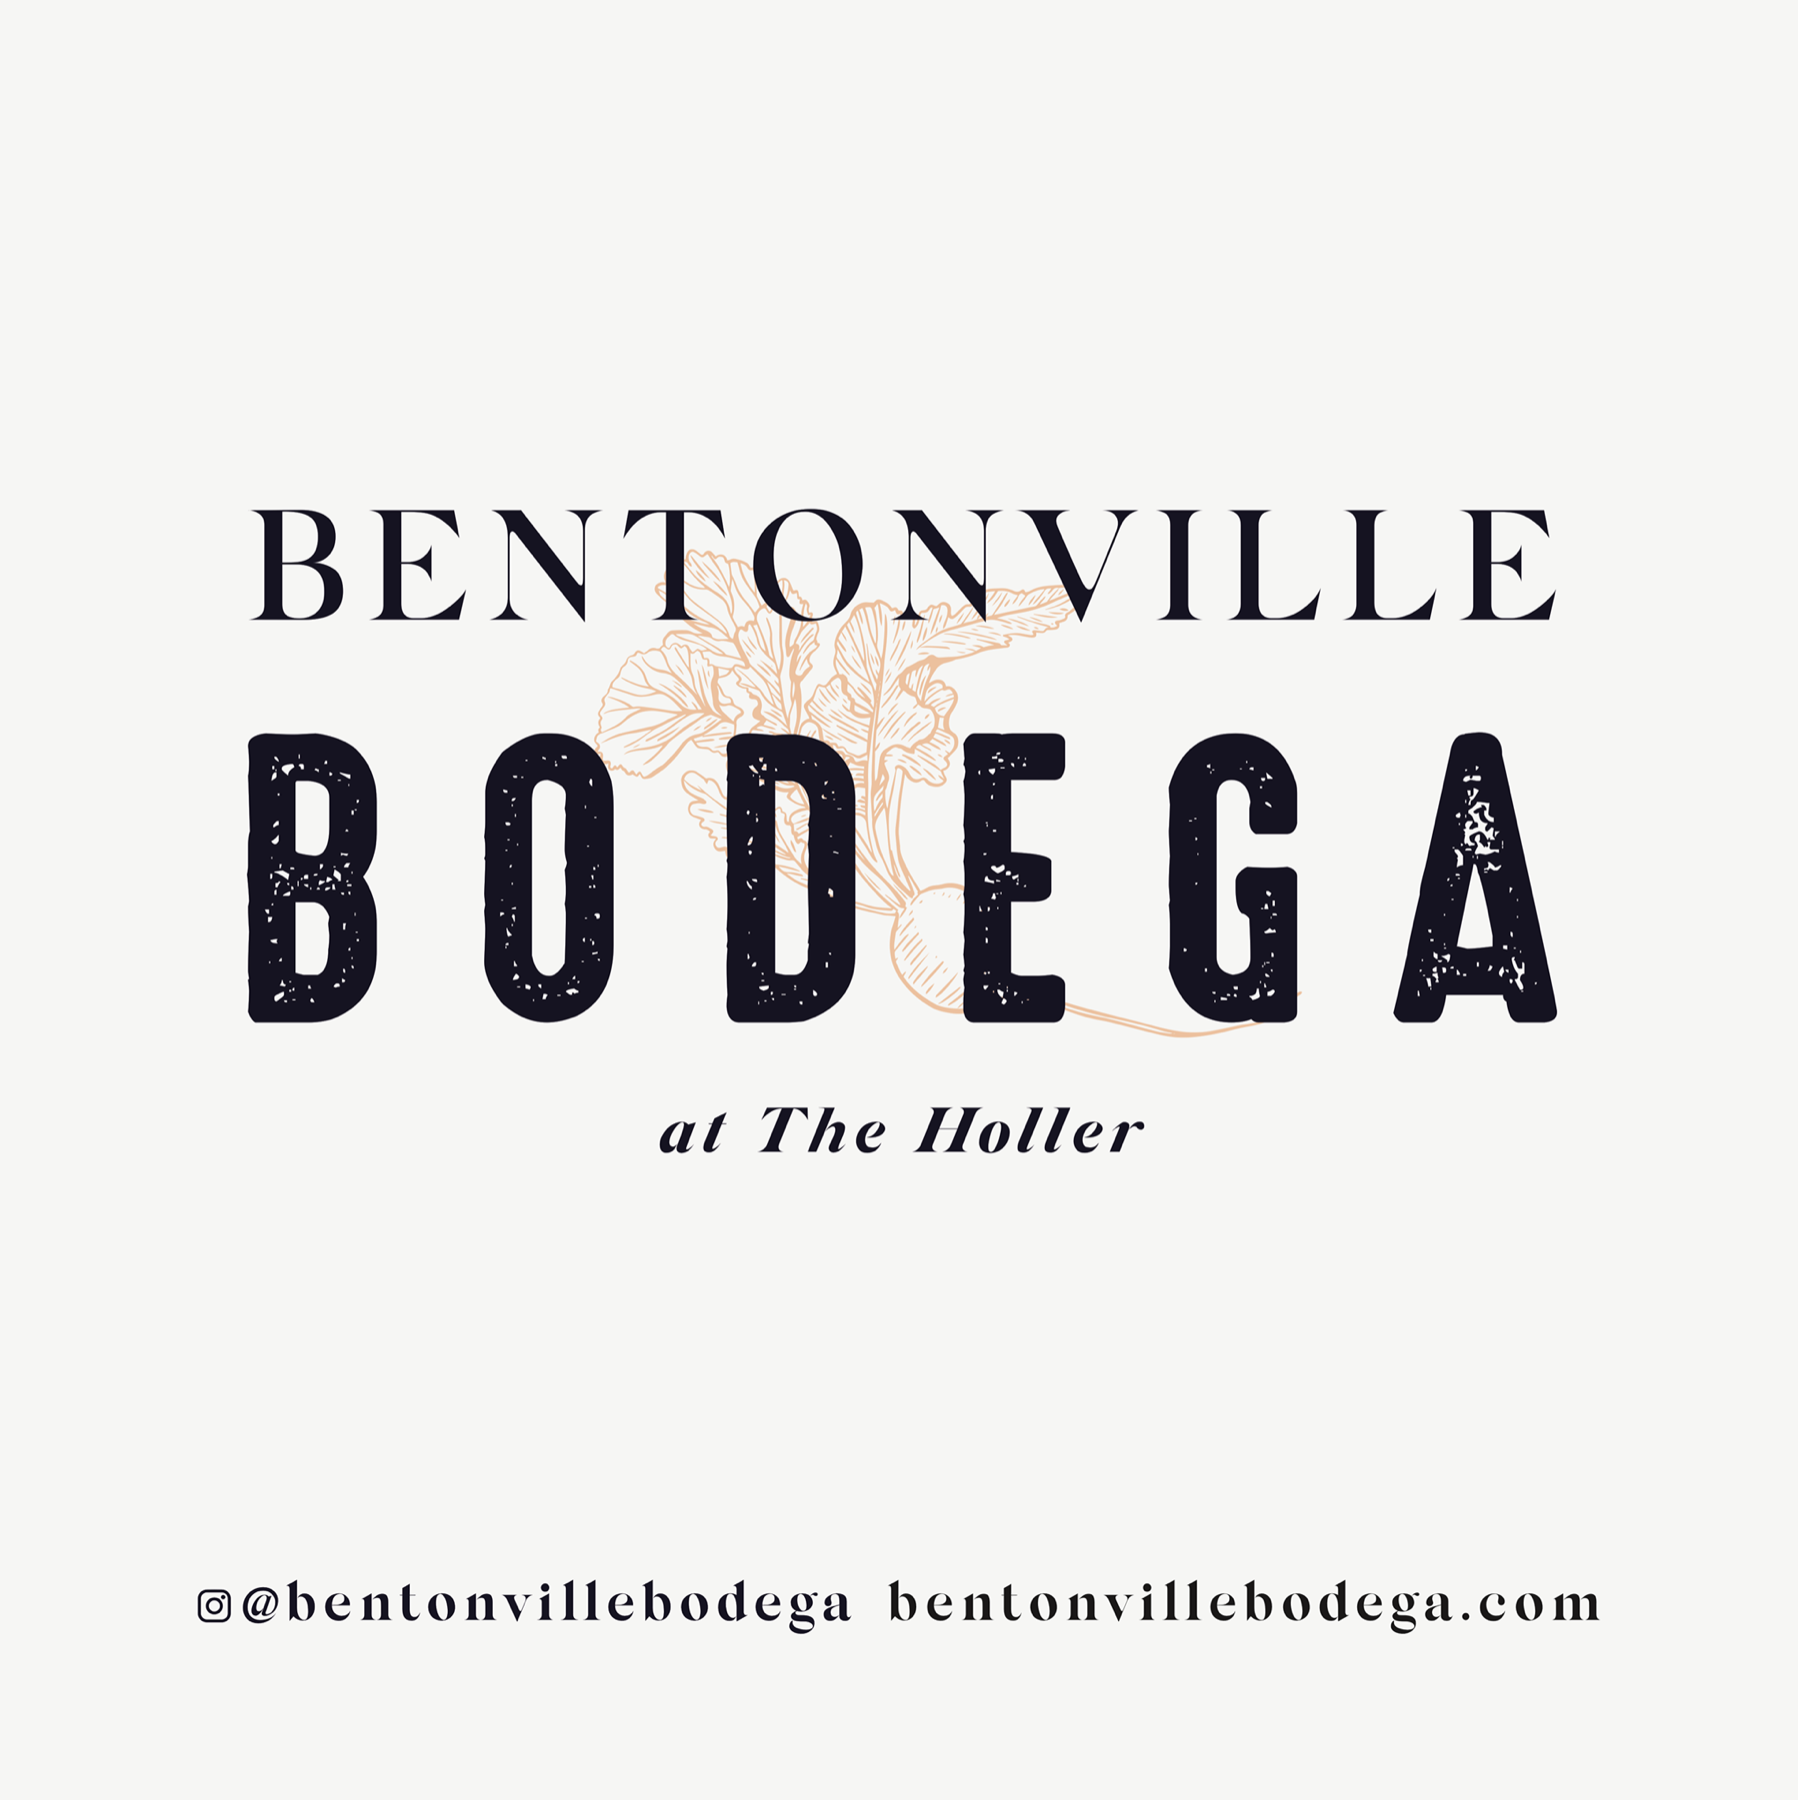 Bentonville Bodega